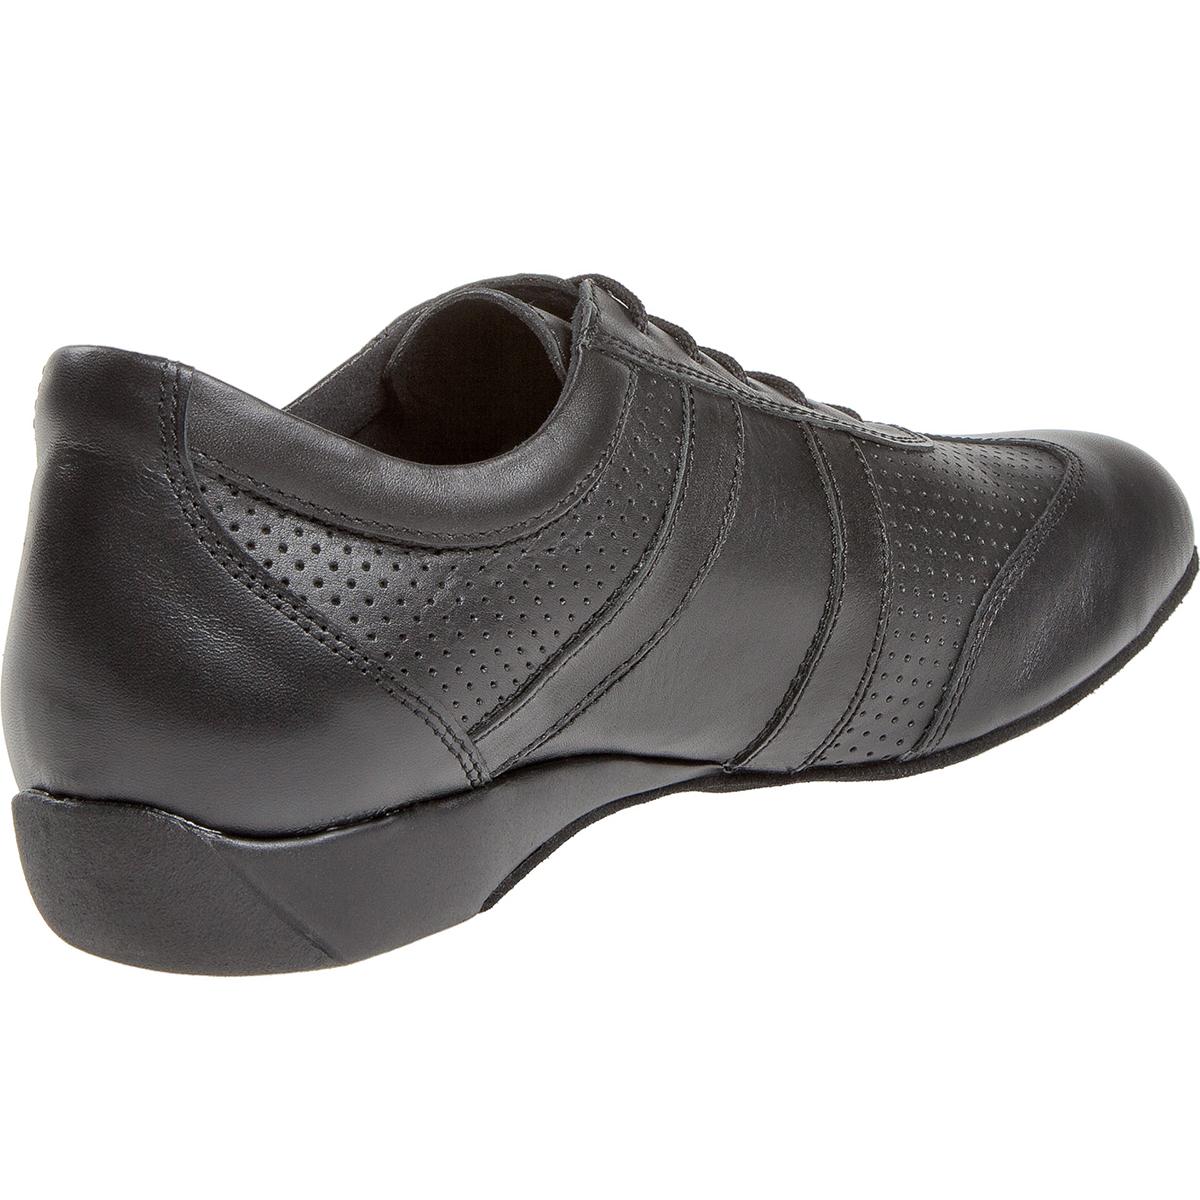 Mens Wide Dance Shoes Ballroom